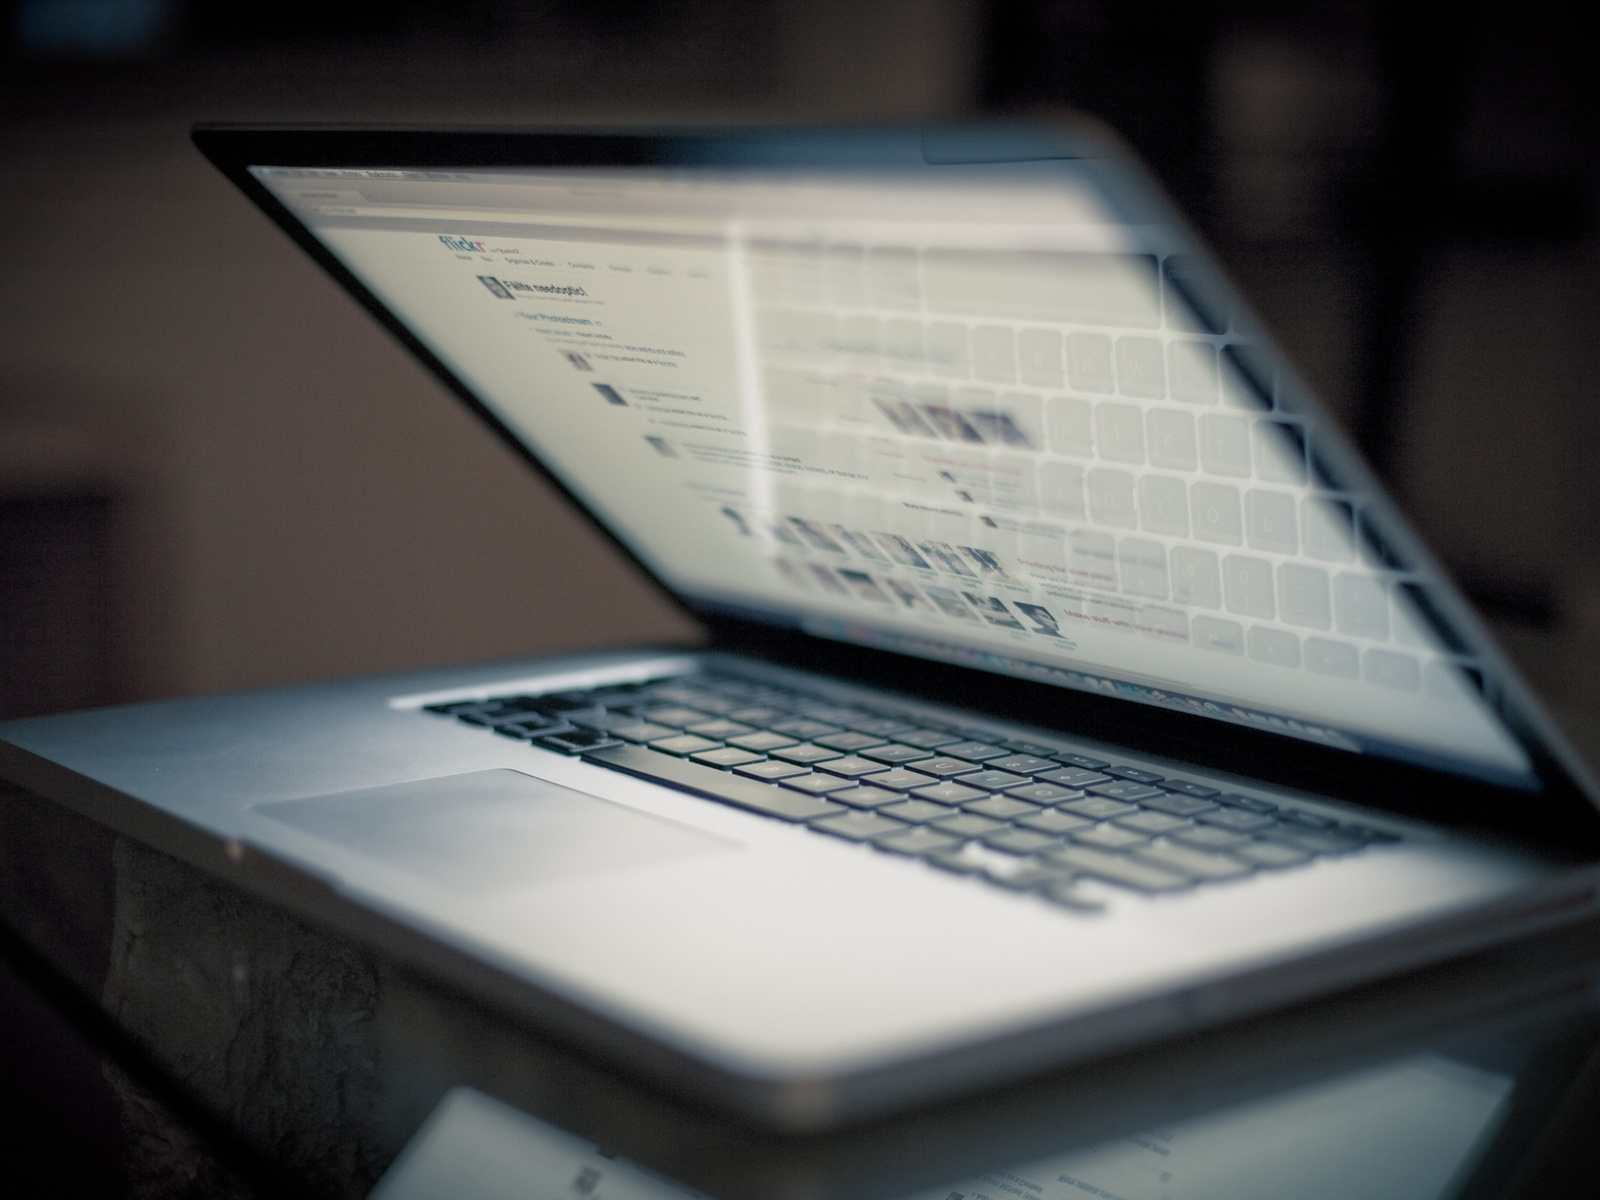 apple macbook pro laptop wallpaper Best Apple full hd download 1600x1200